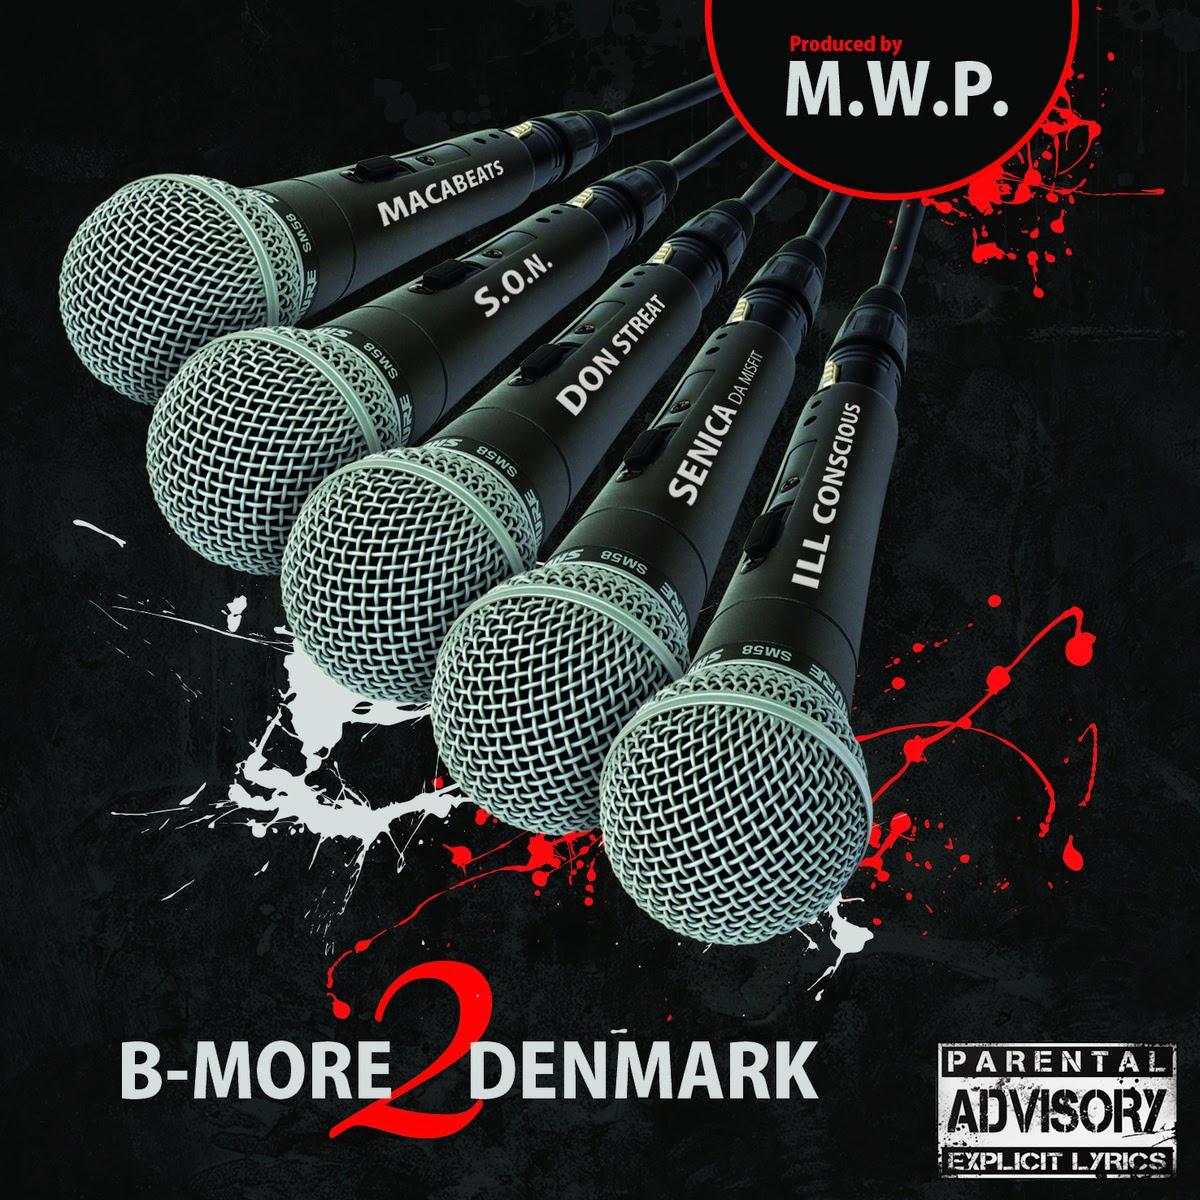 bfbf0eb68baf B-More 2 Denmark by M.W.P. Ft. Don Streat